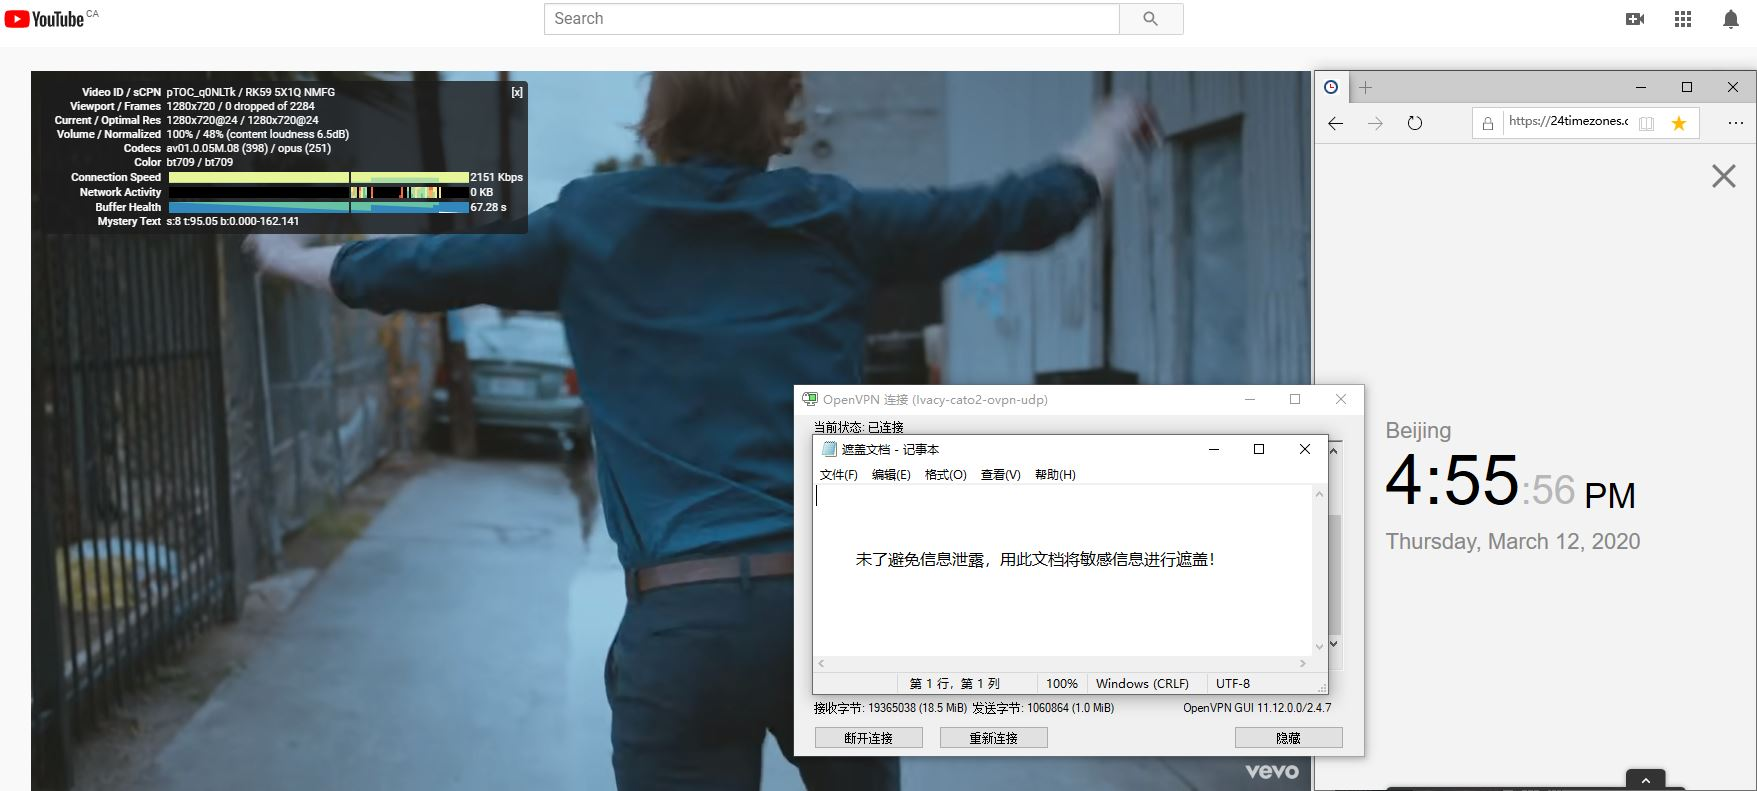 Windows10 IvacyVPN OpenVPN CATO-2 中国VPN翻墙 科学上网 Youtube测速 - 20200312